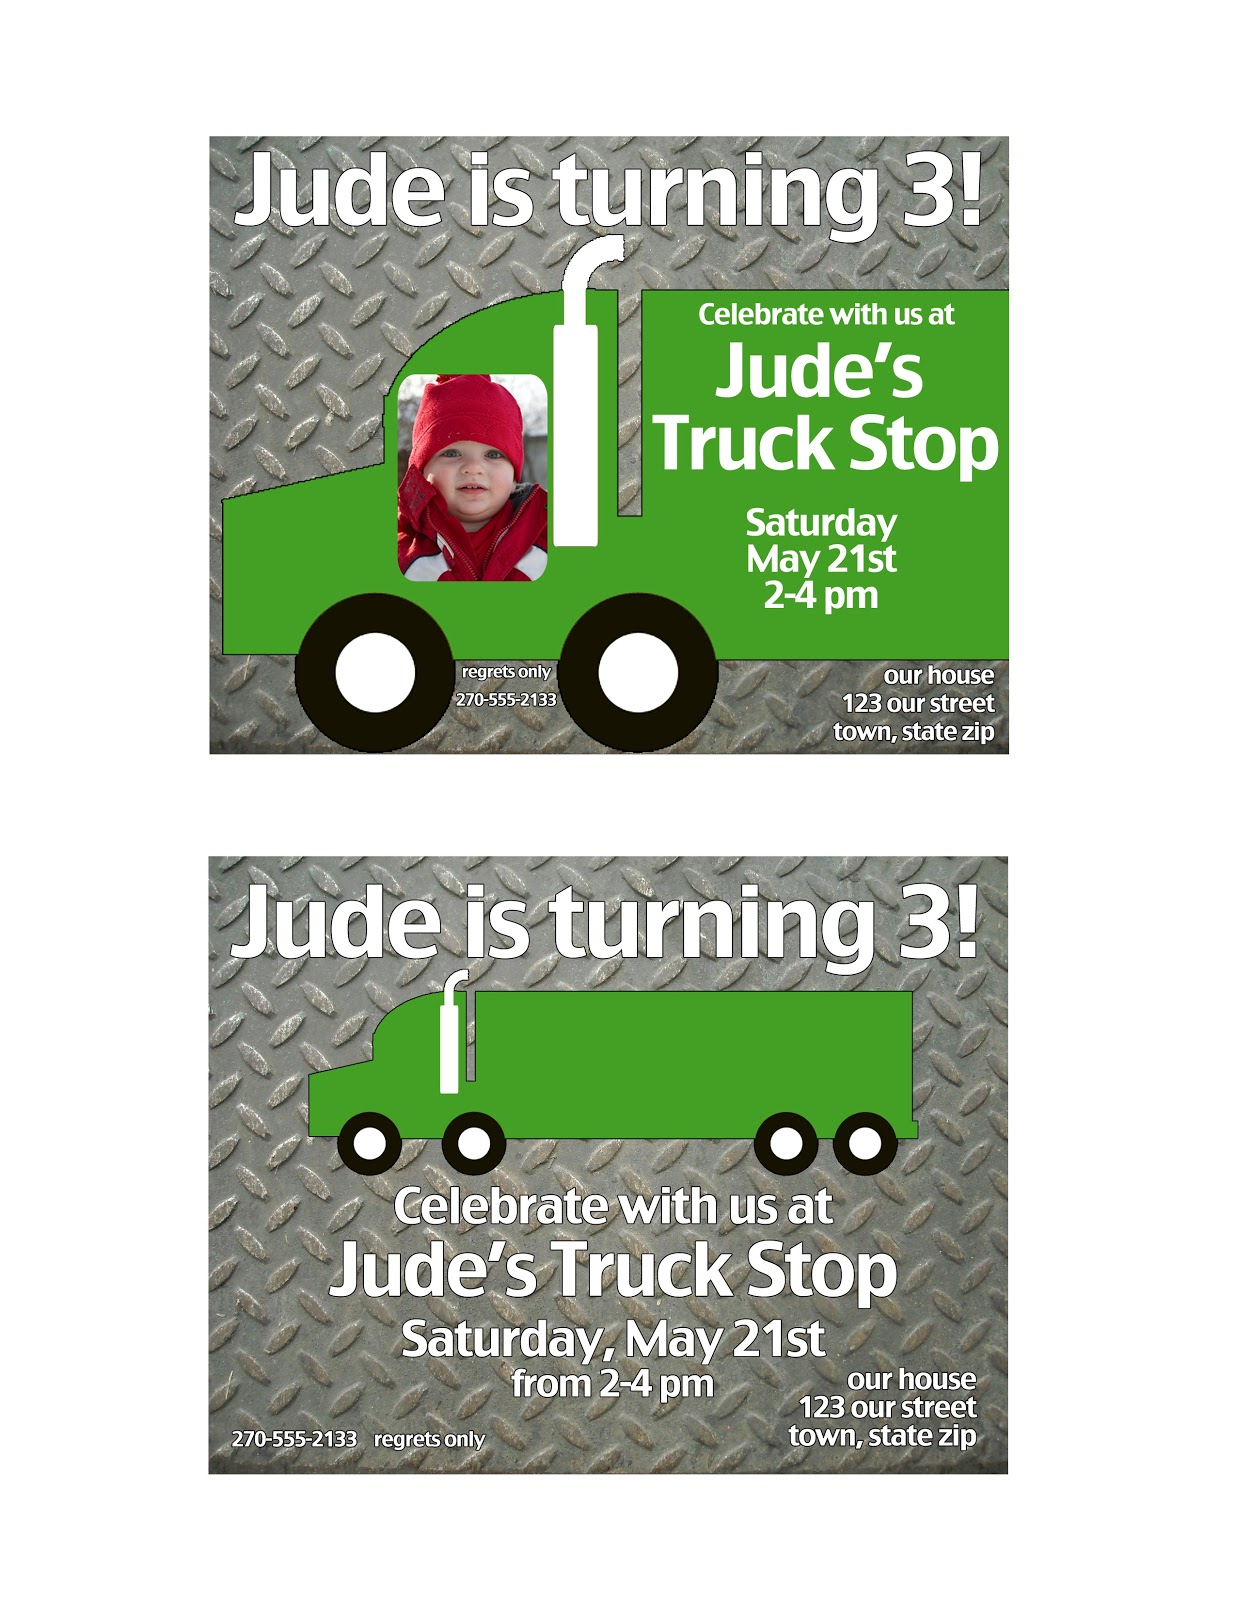 My Messy Manger: Semi Truck Birthday Decorations